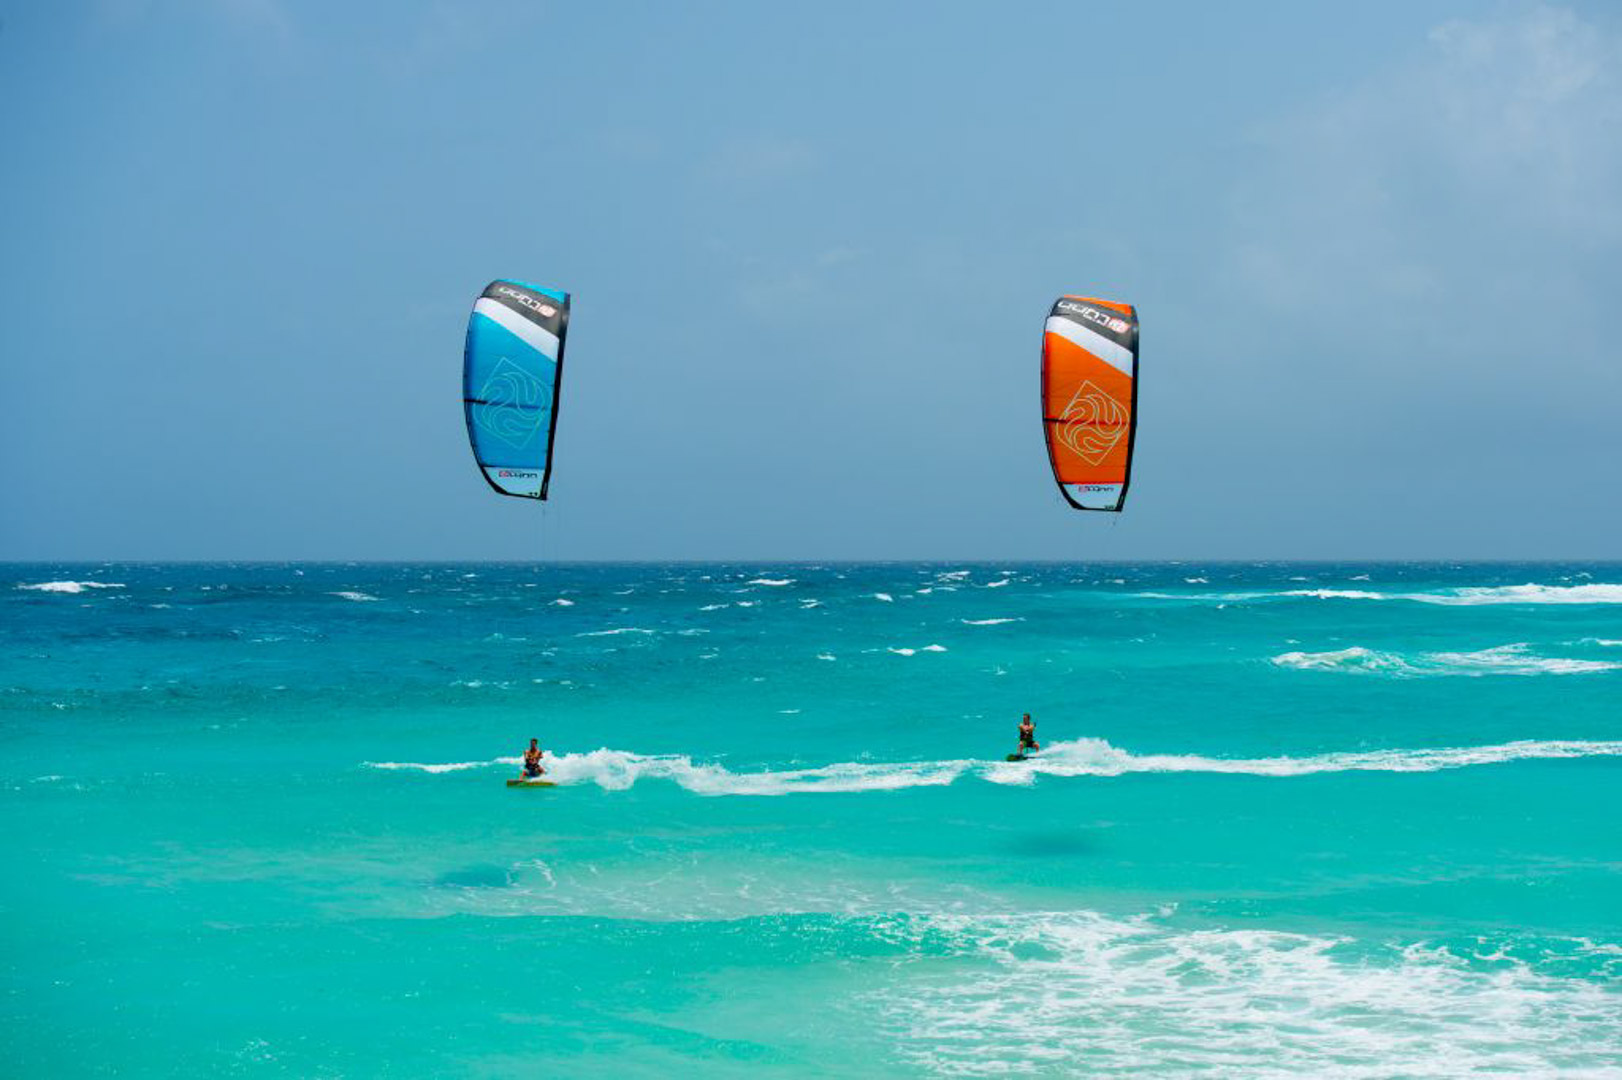 Wochenendkurs kitesurfen